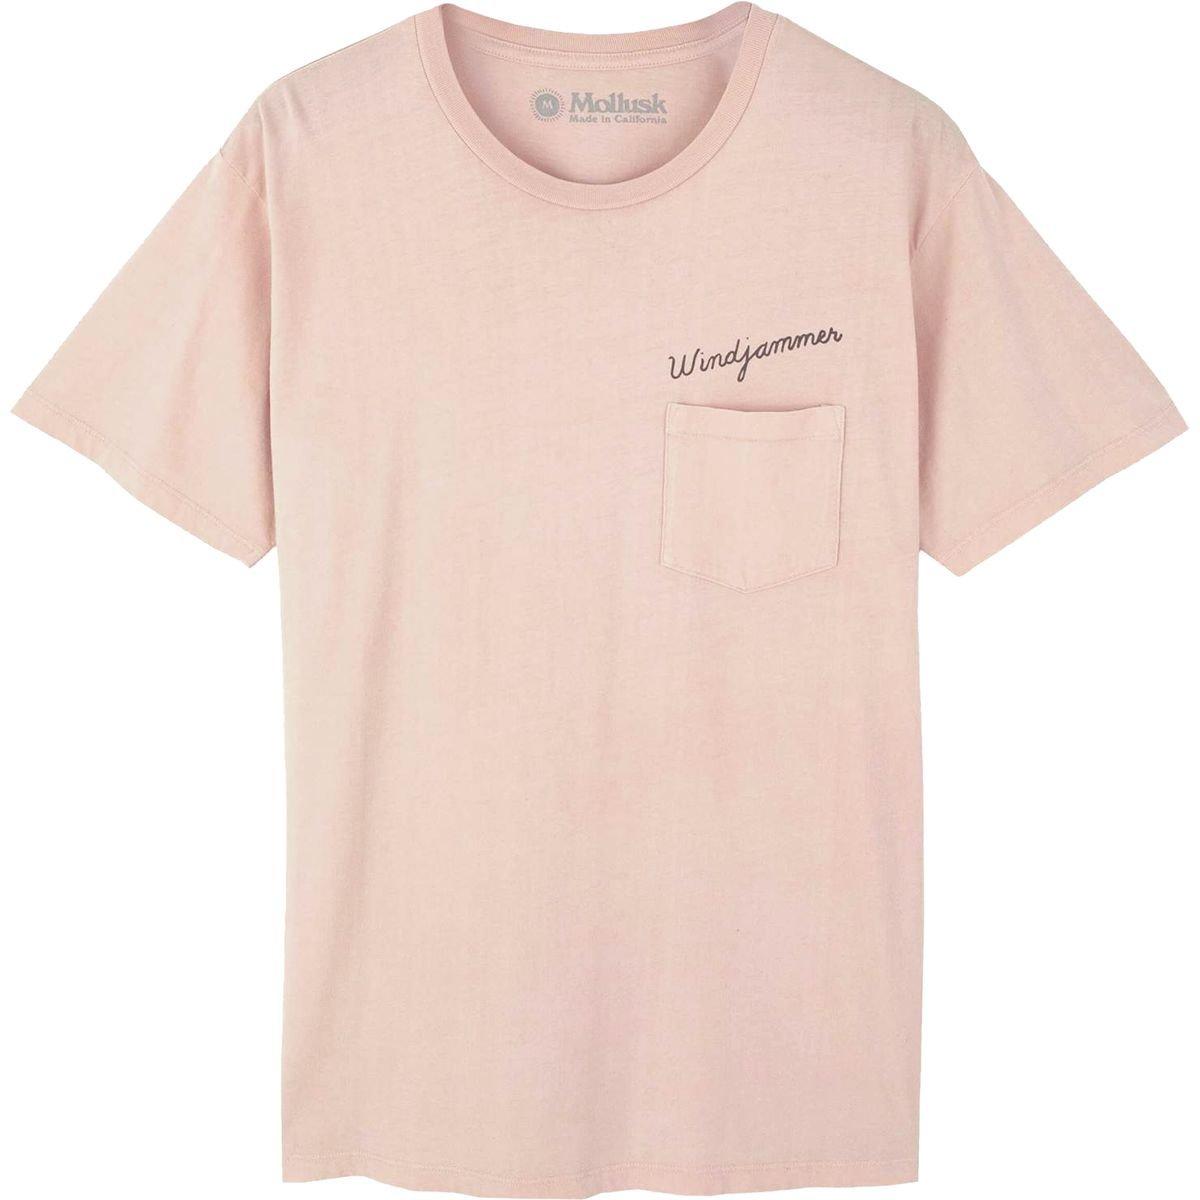 f74d2f7f66c2 Amazon.com: Mollusk Windjammer T-Shirt - Men's Blush, S: Clothing